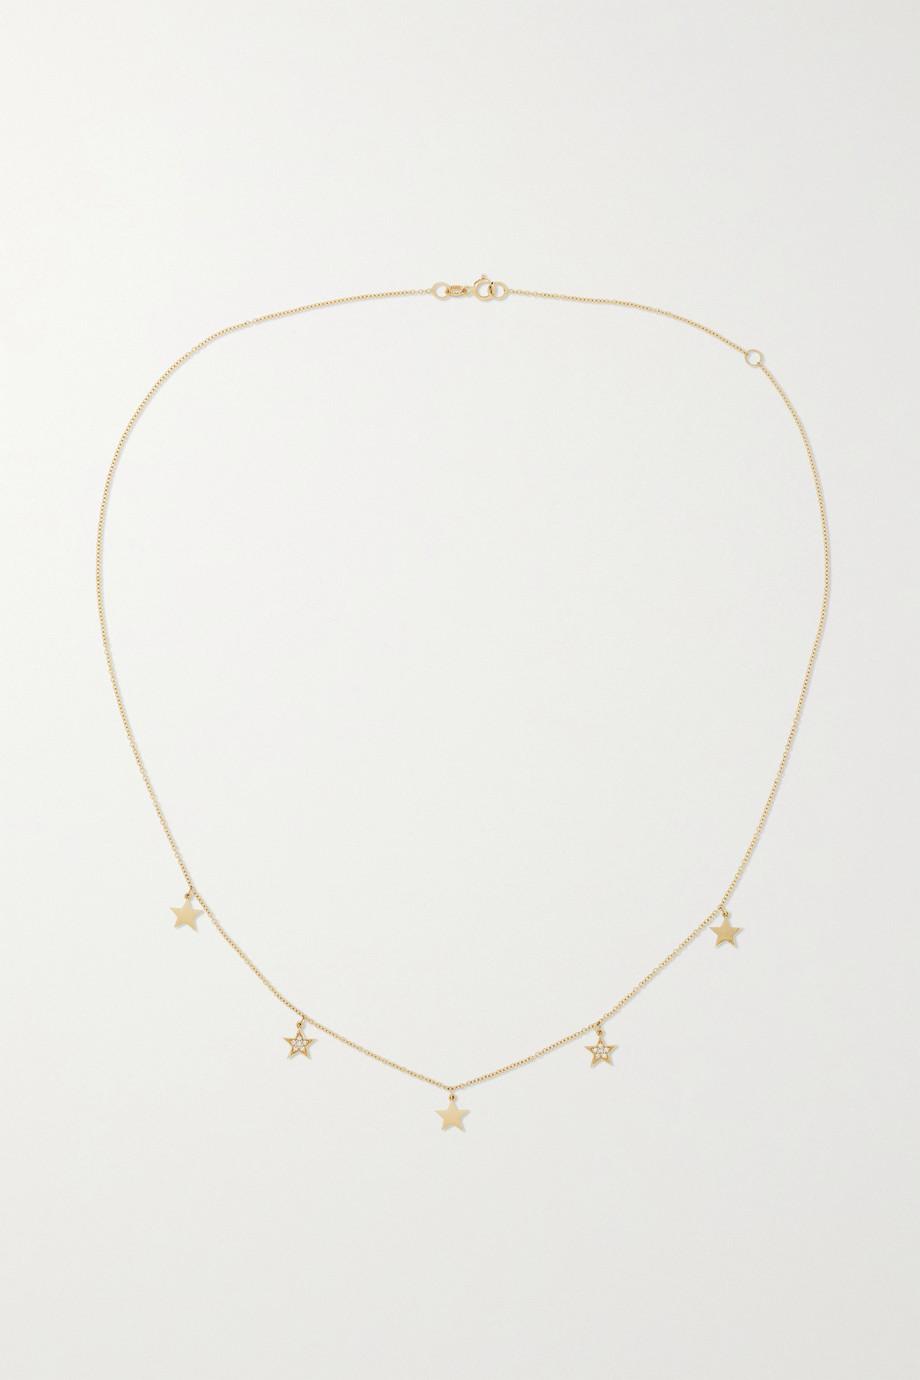 Andrea Fohrman Collier en or 14 carats et diamants Star